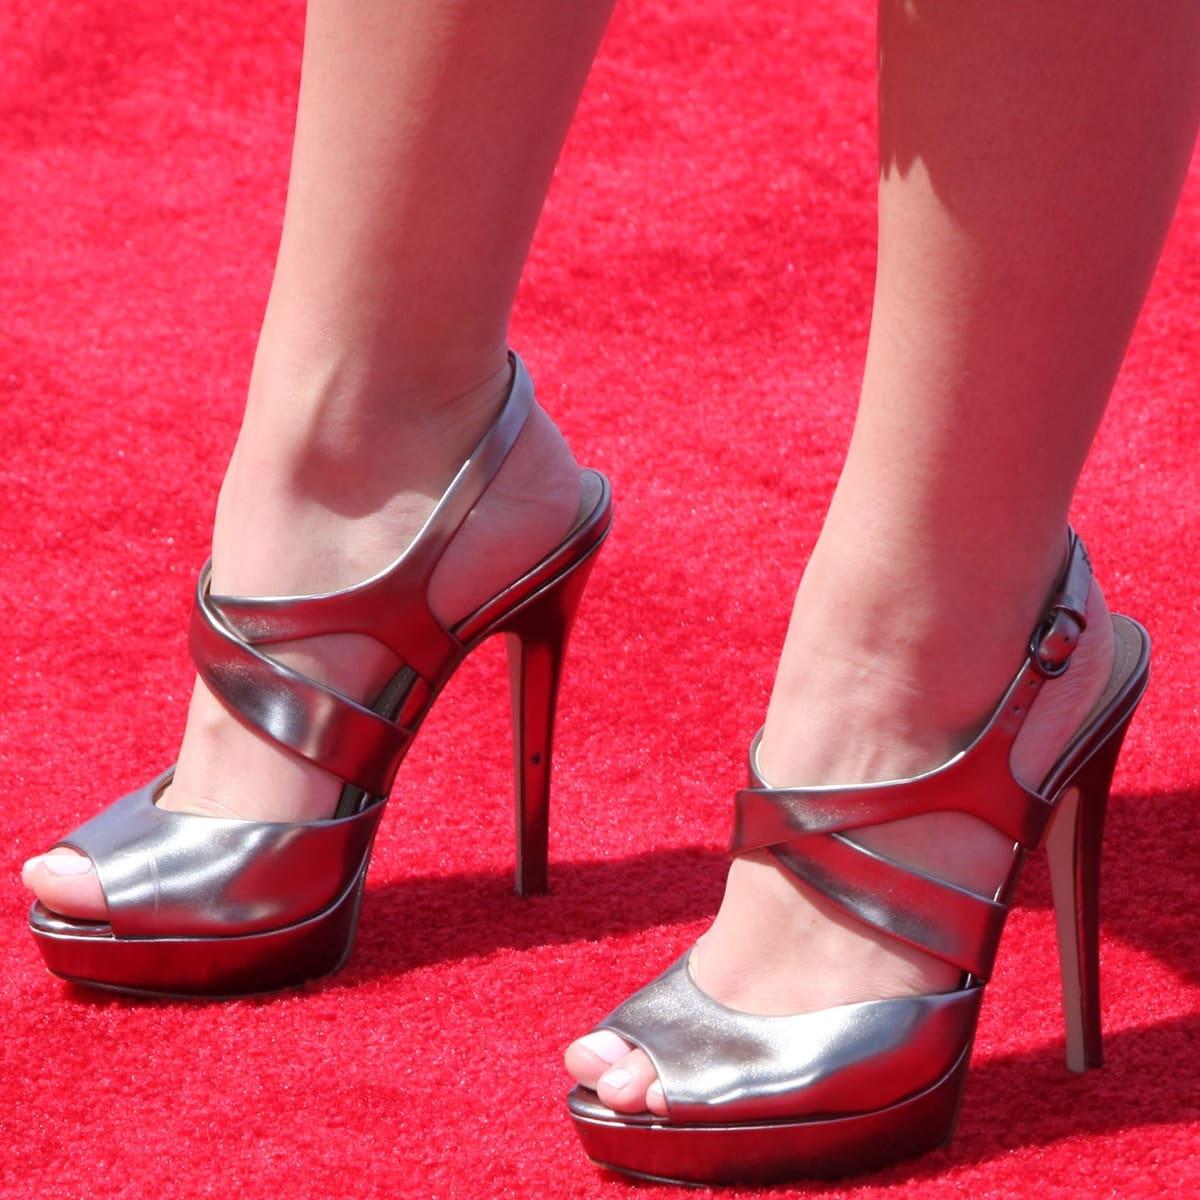 Paris Berelc shows off her size 7.5 (US) feet in high heels